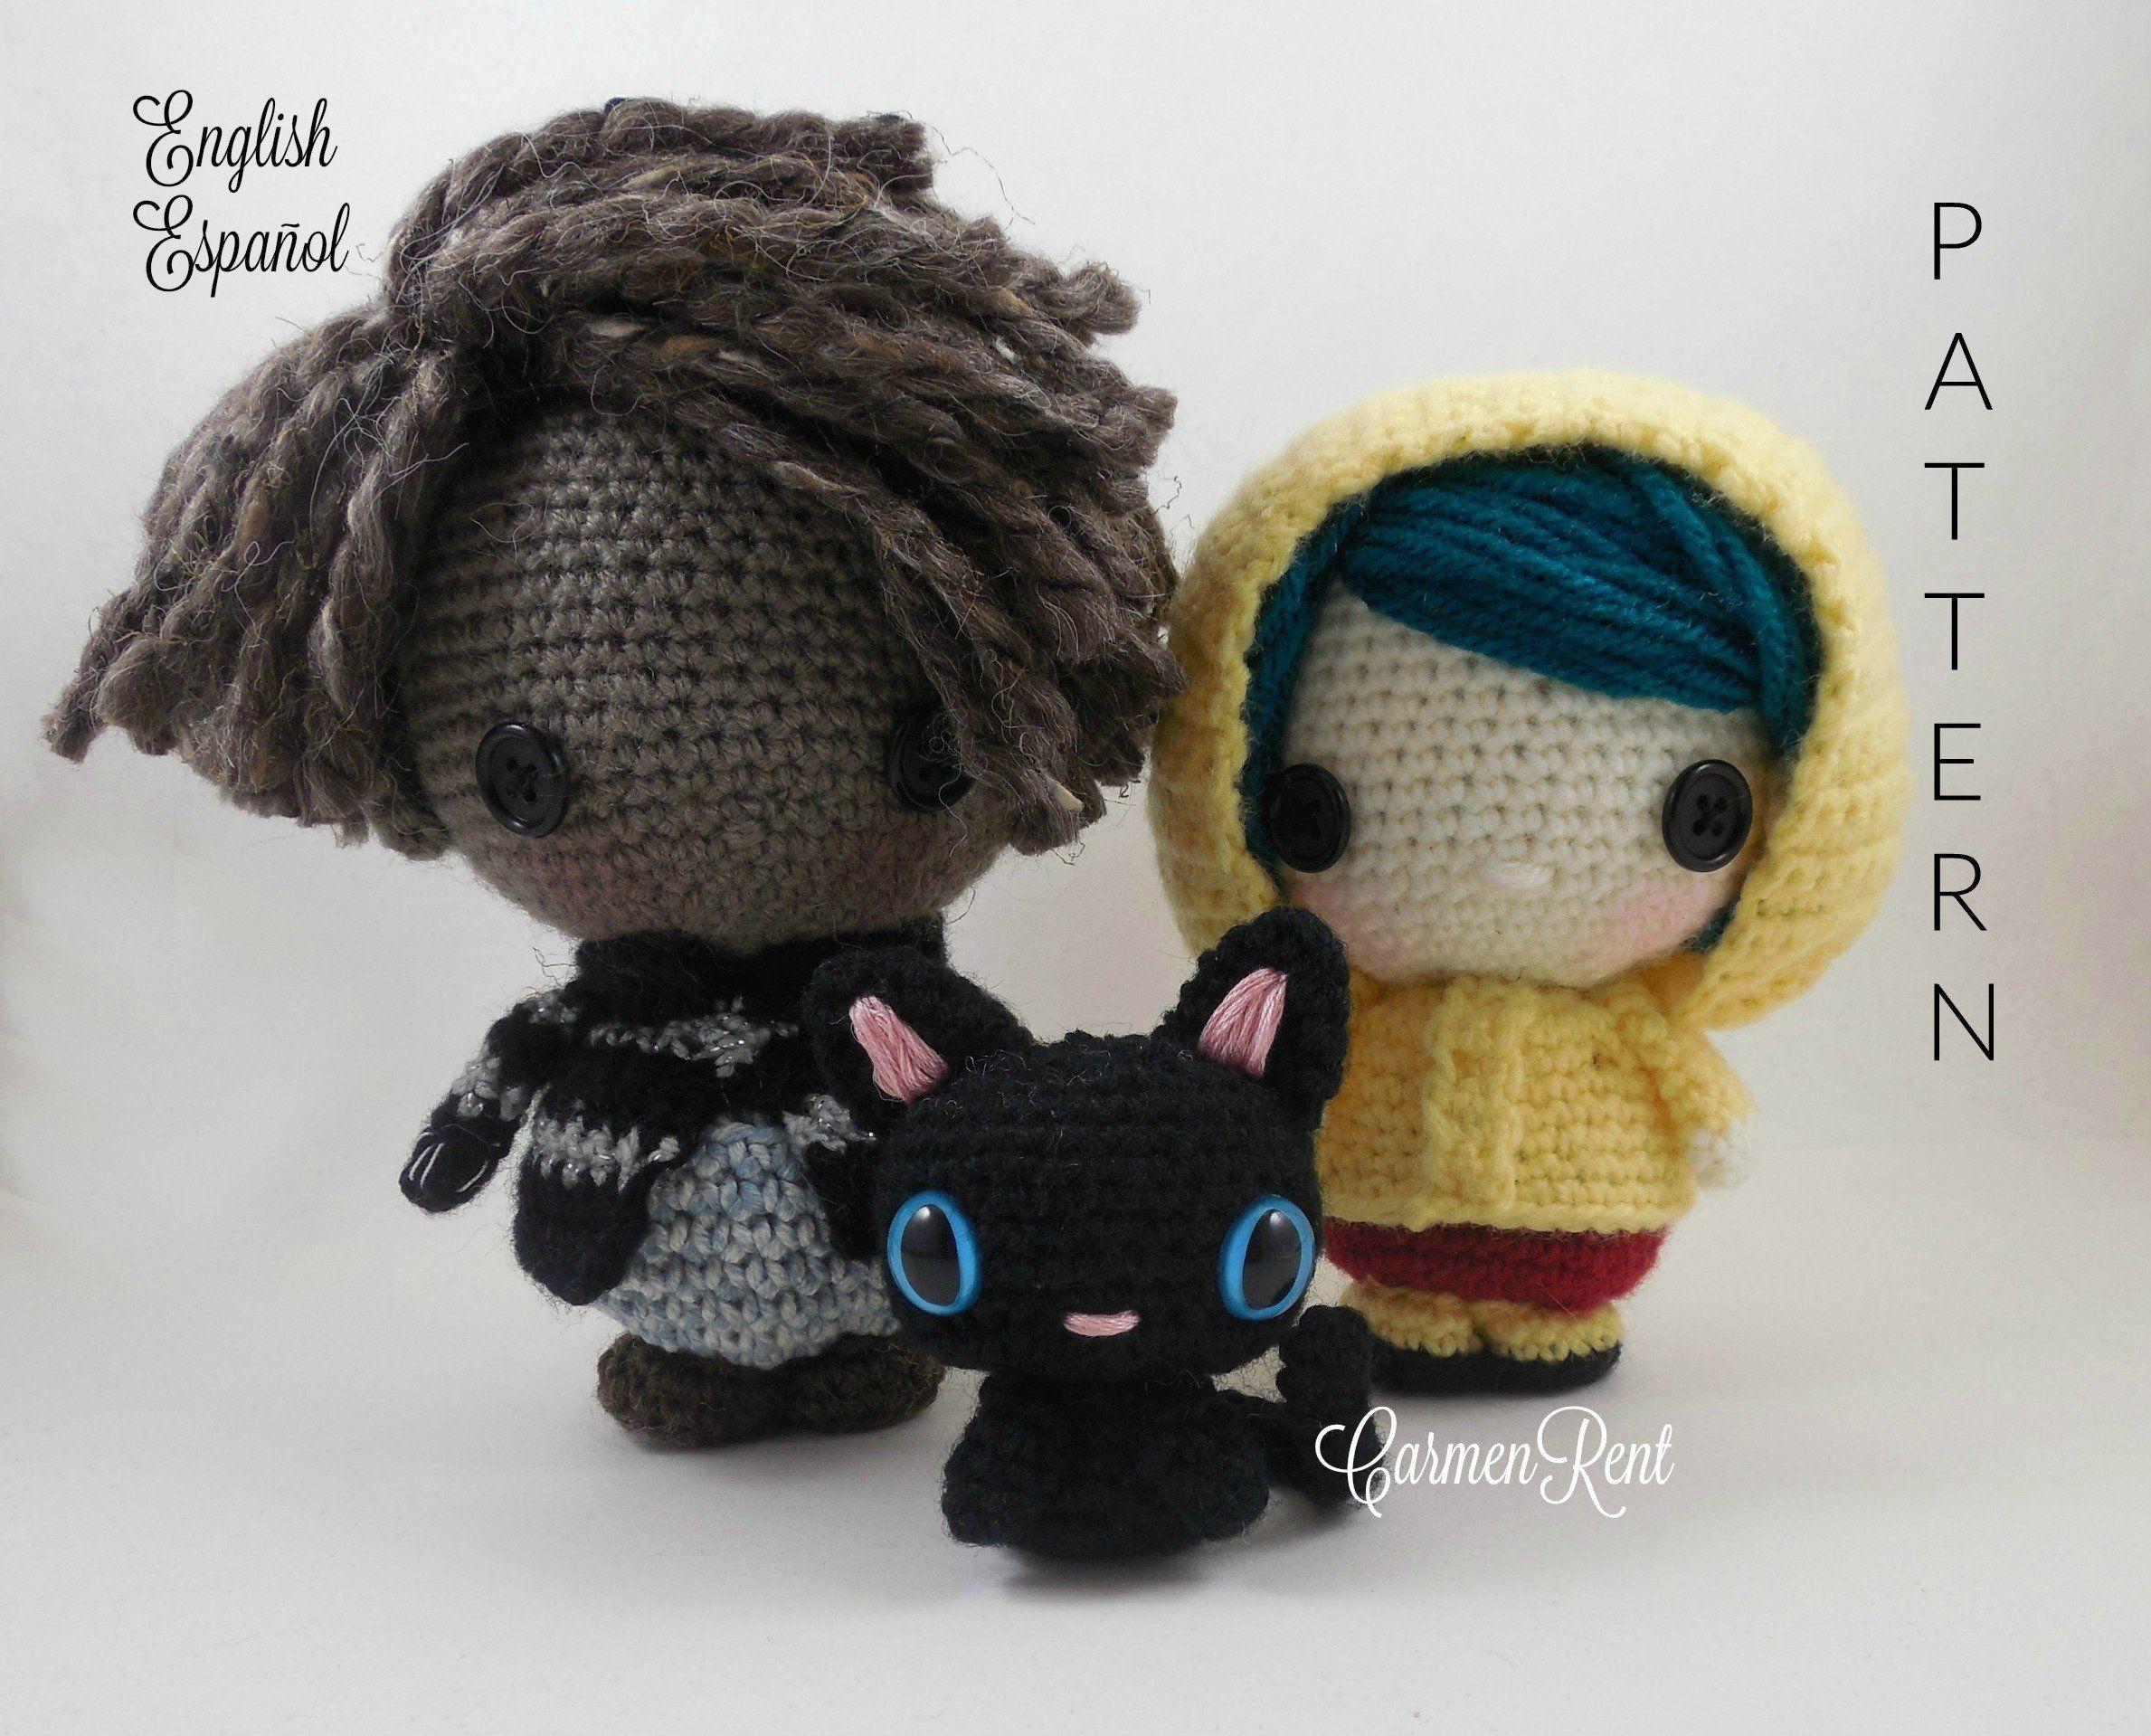 Wybie 7 Coraline 6 And Cat 3 1 2 Chibi Etsy In 2021 Amigurumi Doll Crochet Patterns Coraline